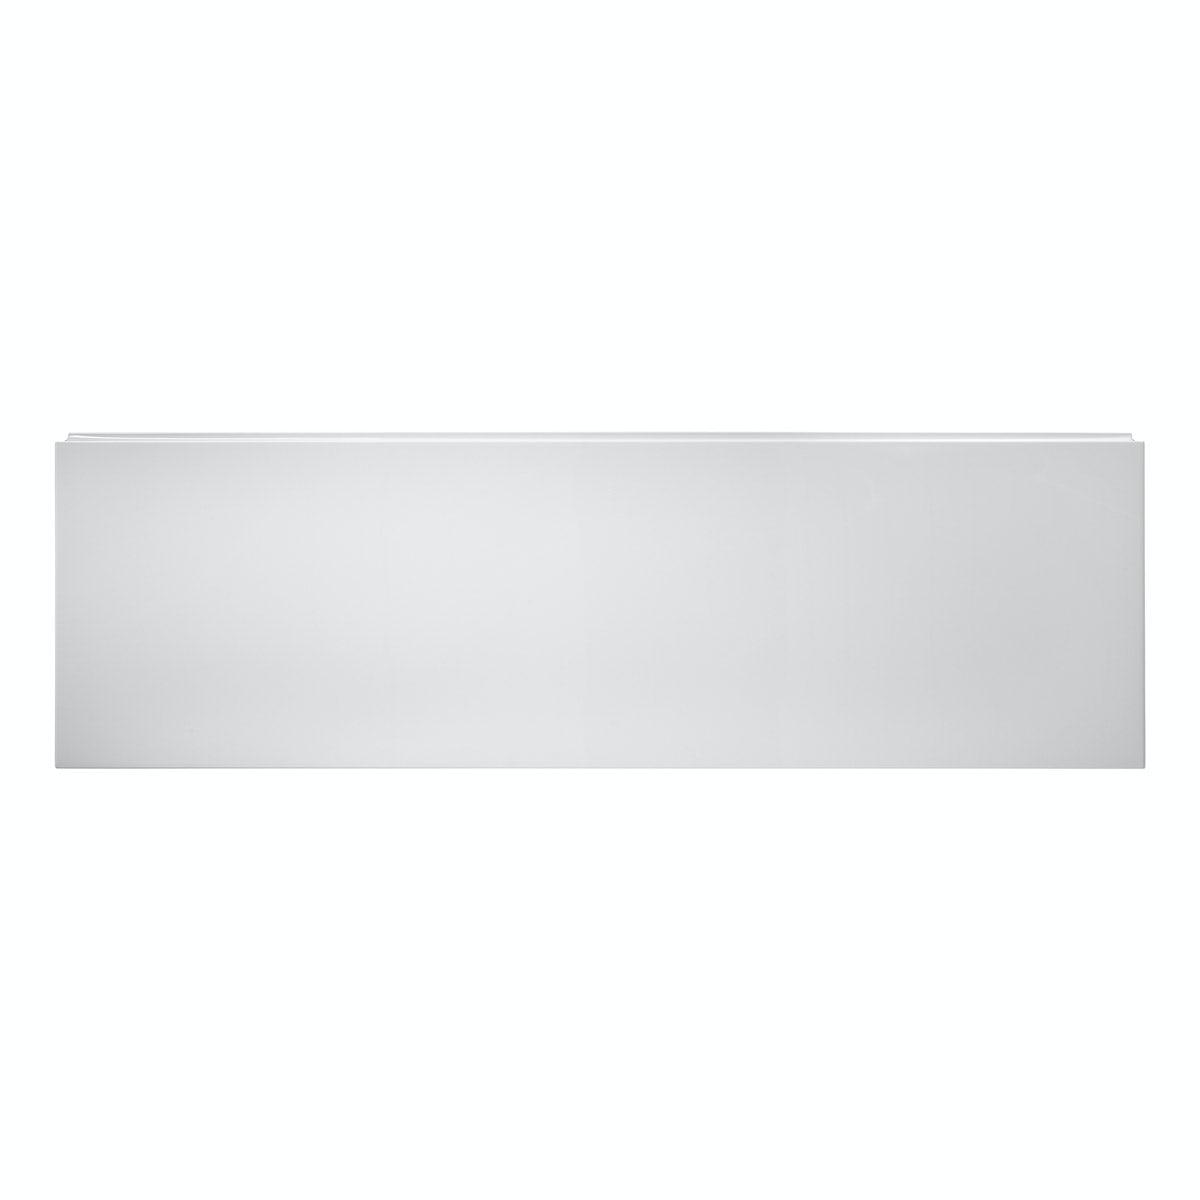 Ideal Standard Unilux Plus+ acrylic front bath panel 1700mm